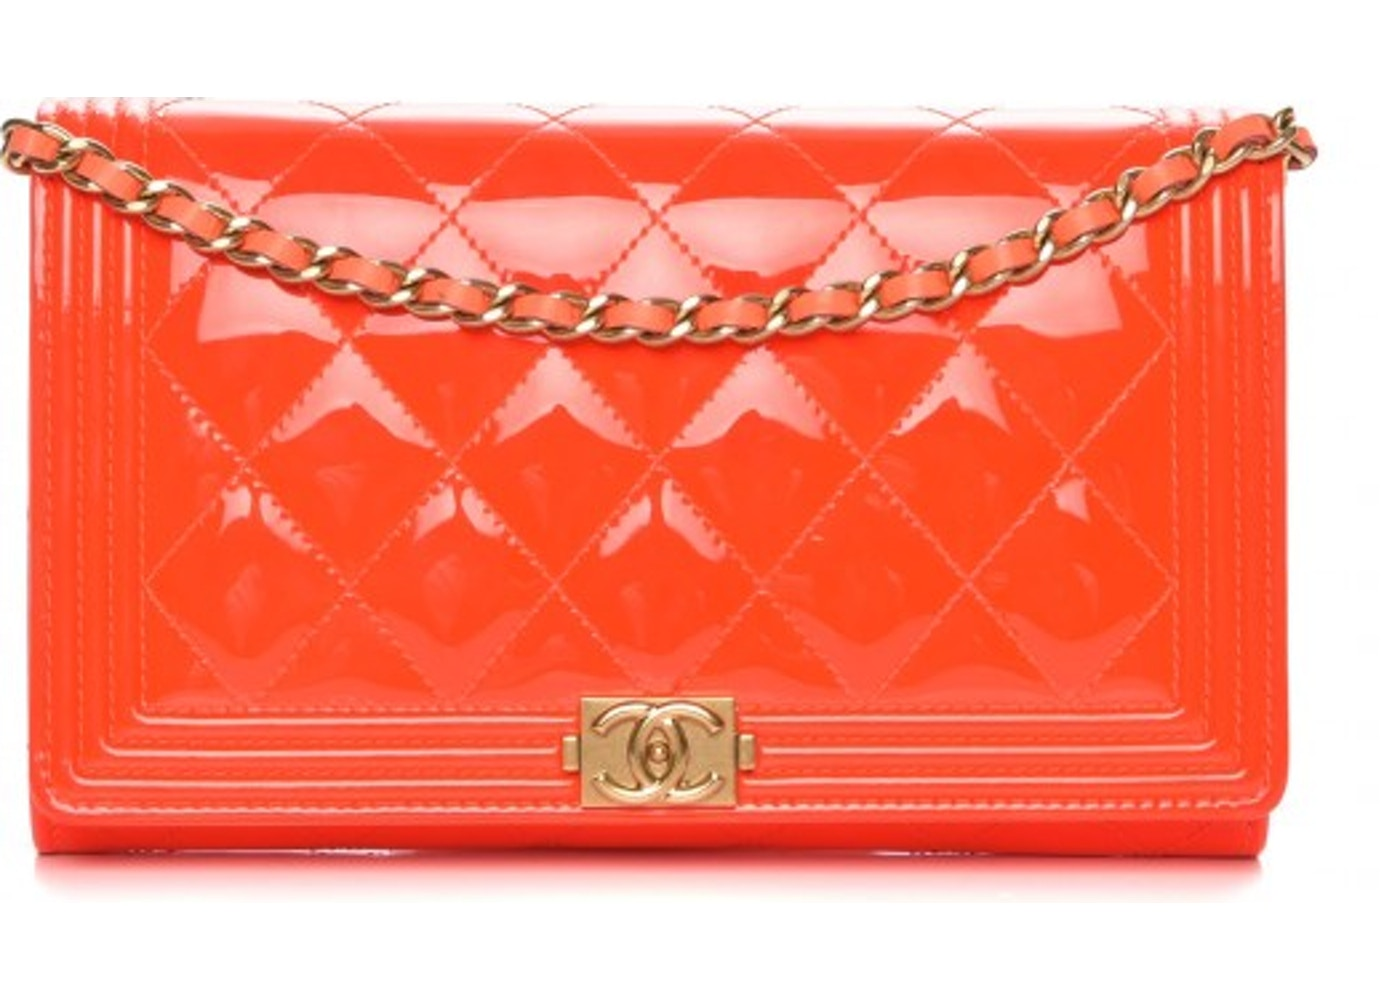 a30f203bc3fa2 Buy   Sell Chanel WOC Handbags